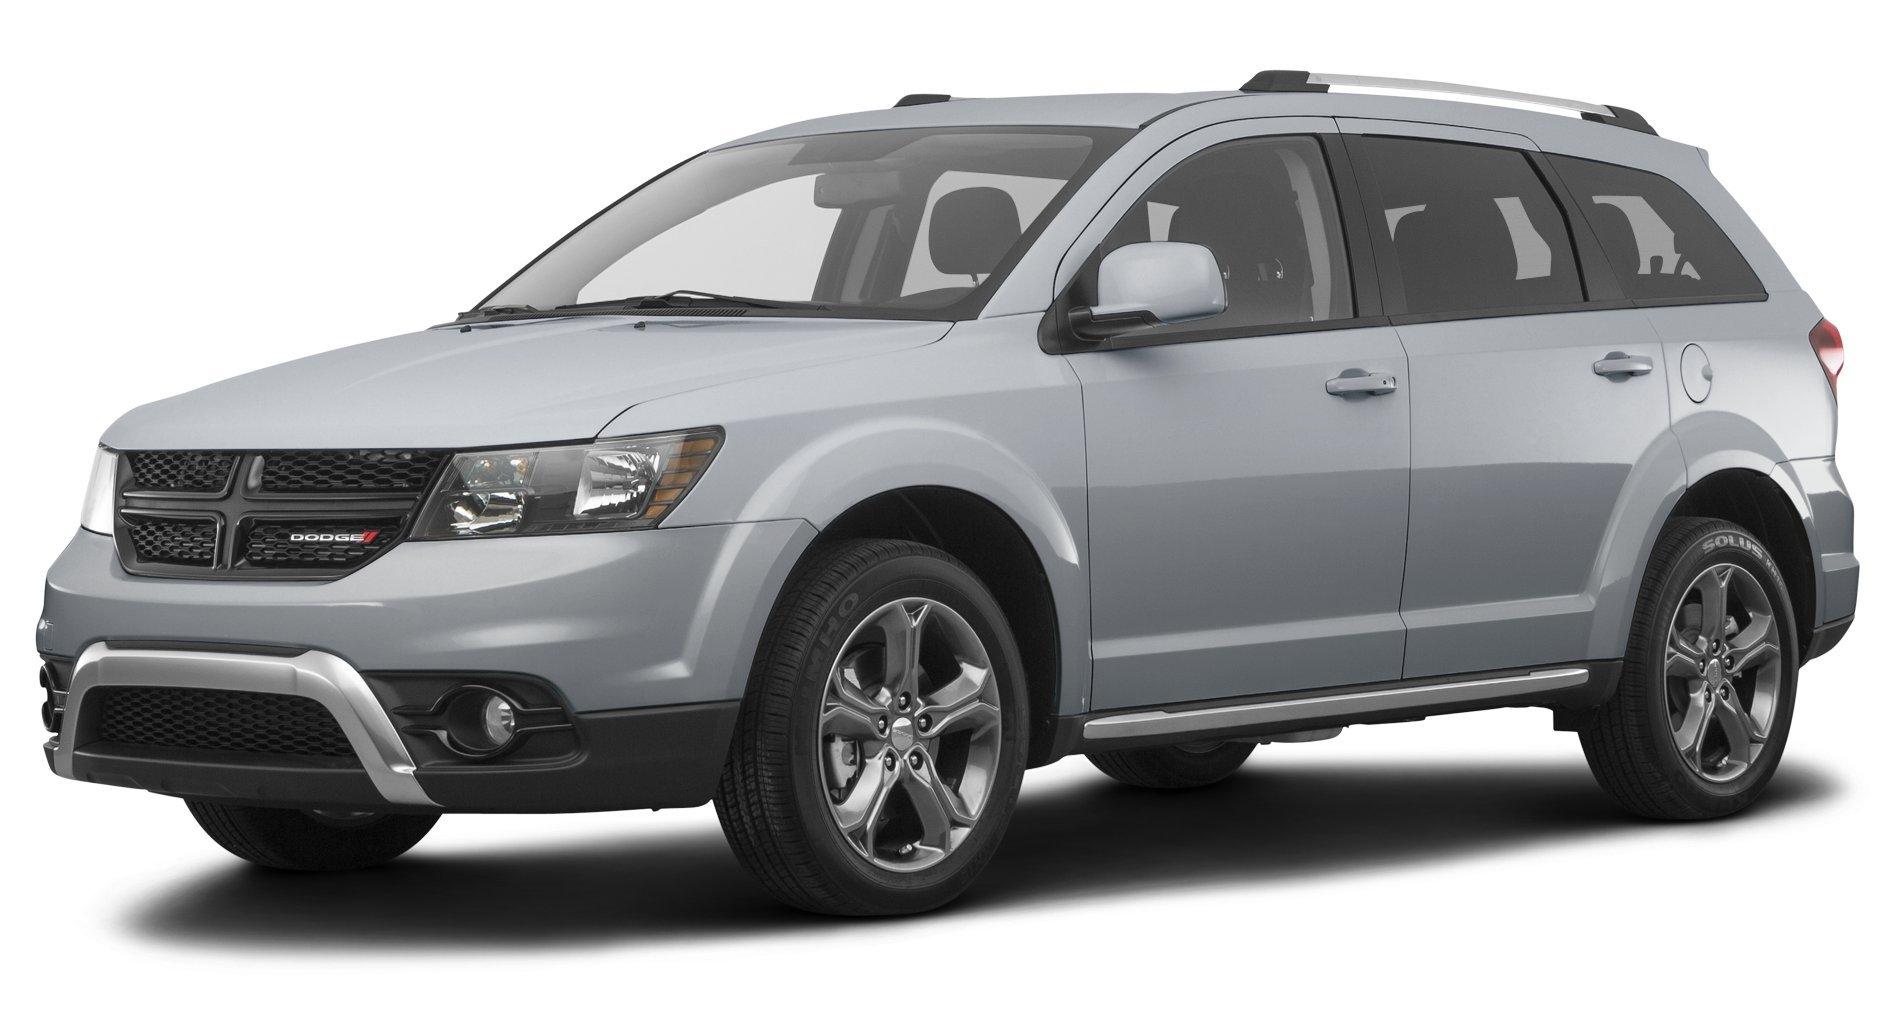 2016 Dodge Journey >> Amazon Com 2016 Dodge Journey Reviews Images And Specs Vehicles